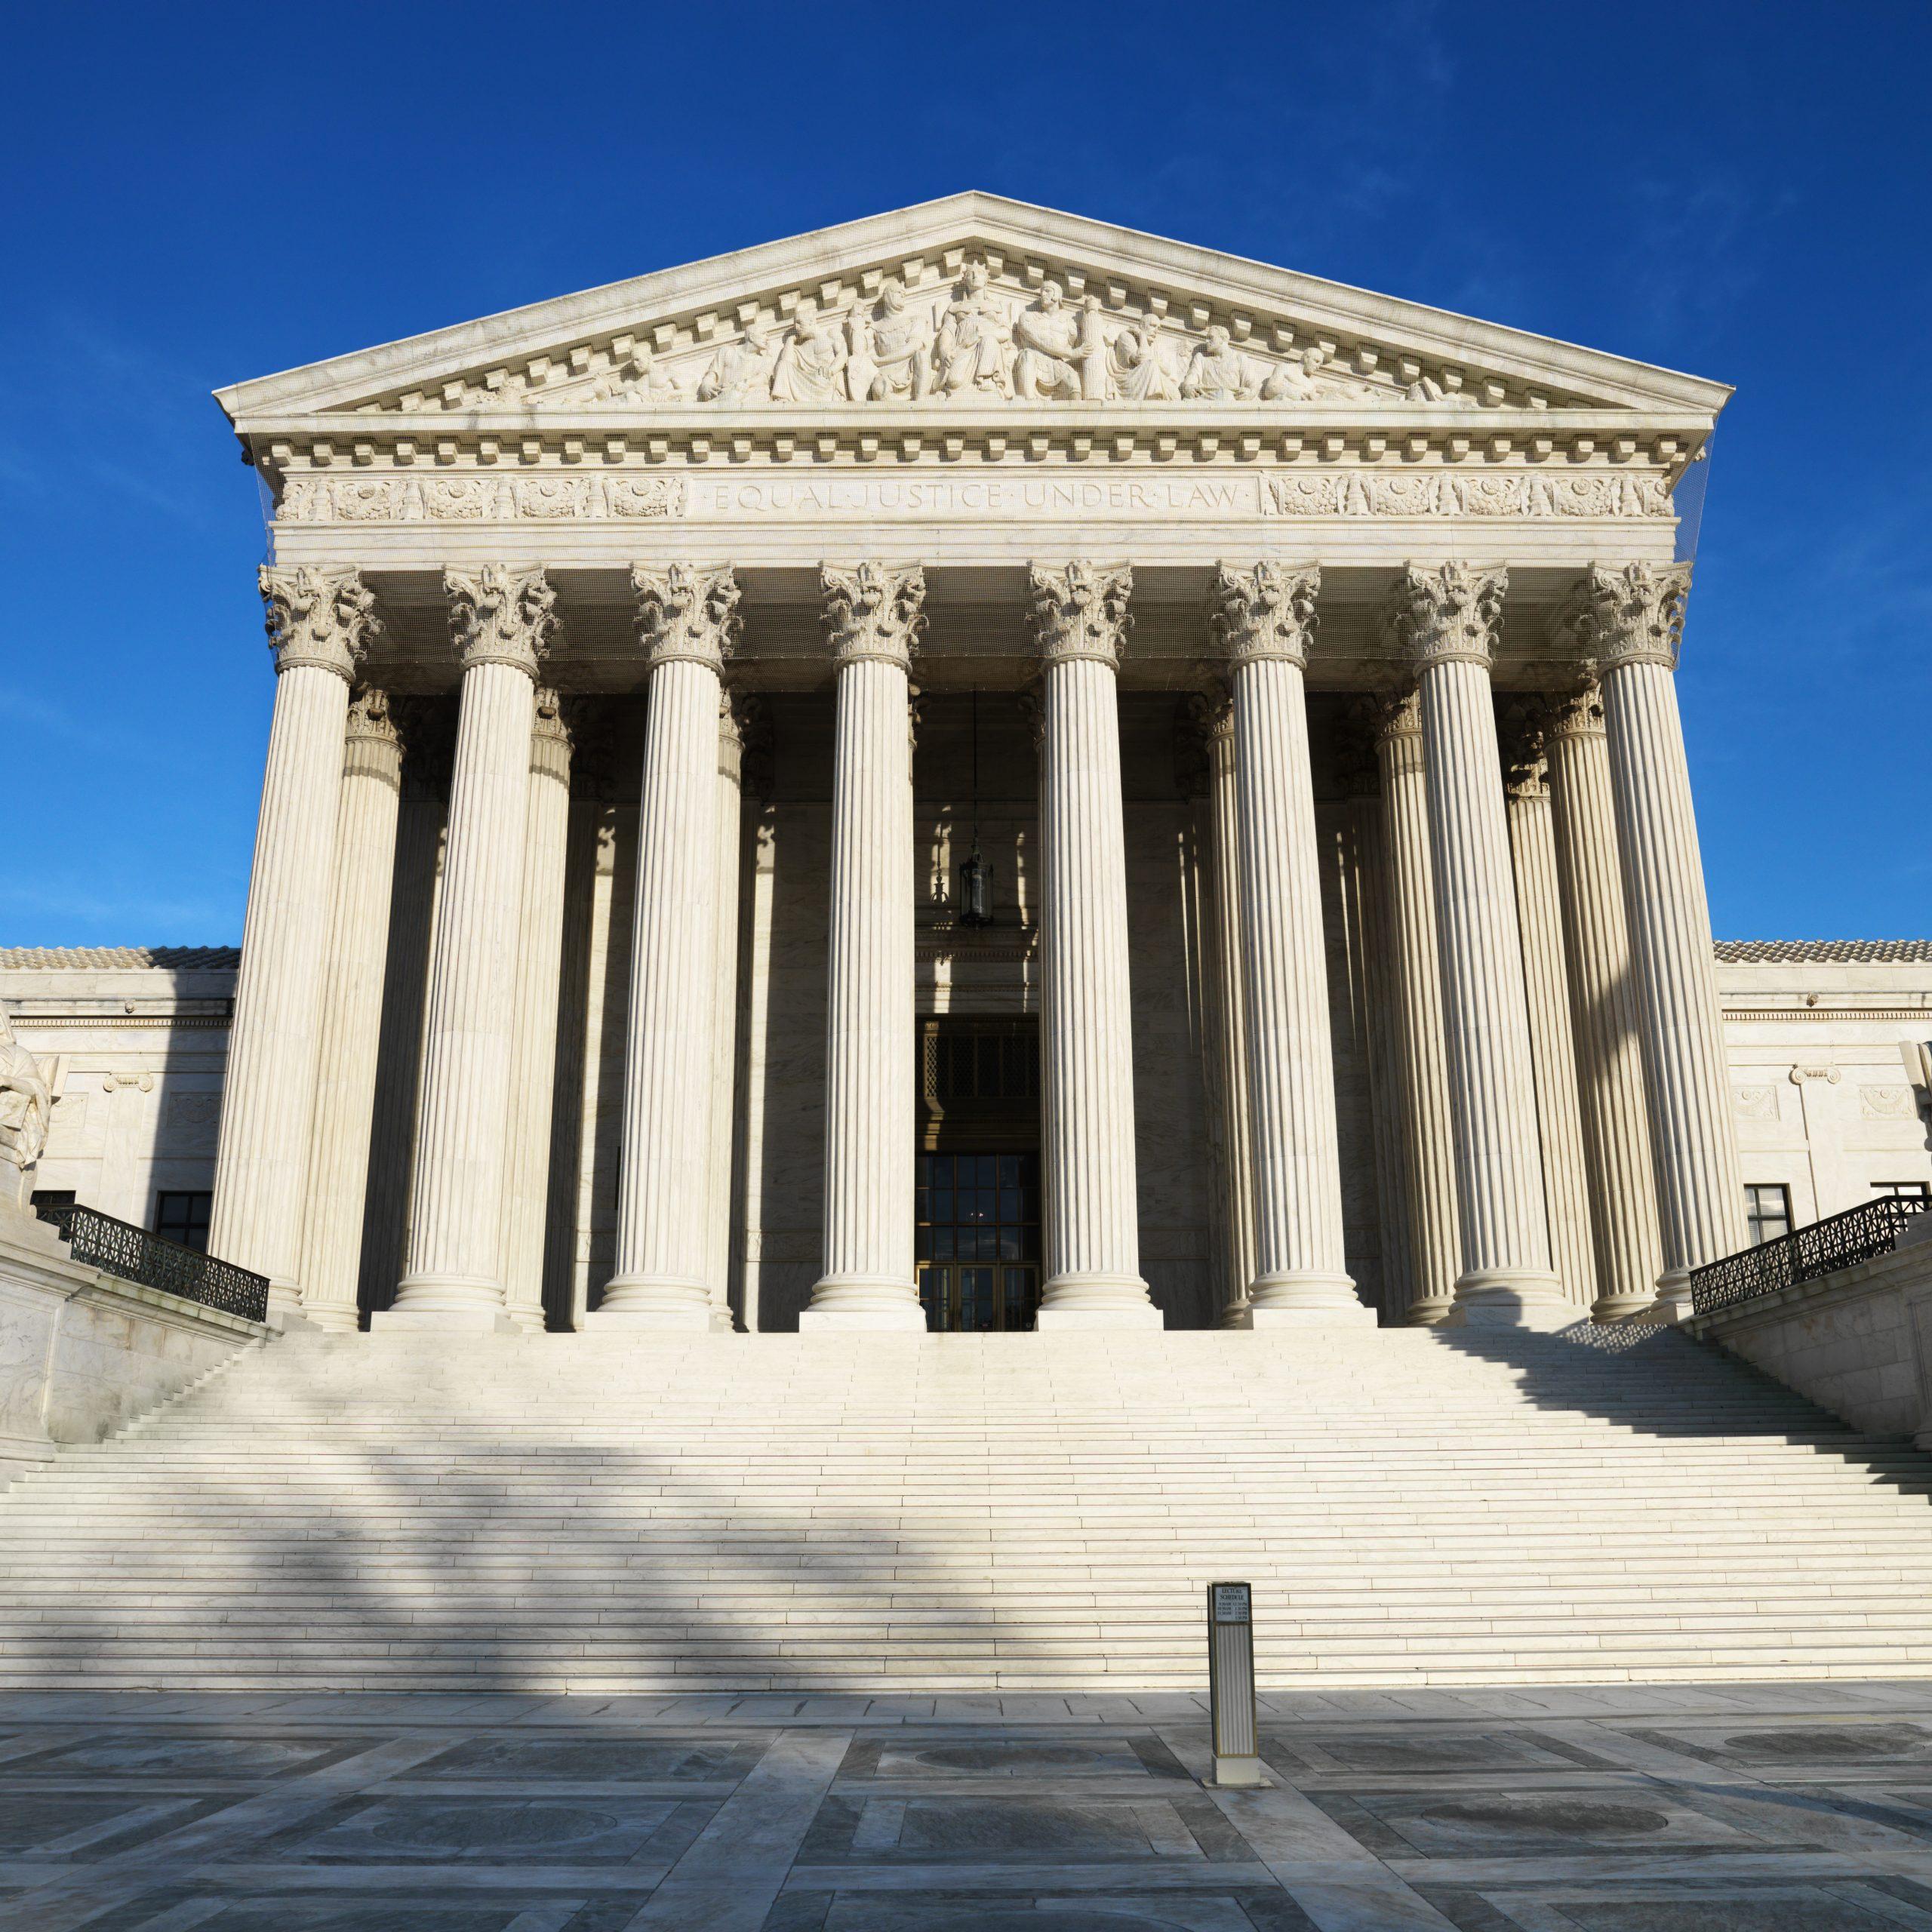 Supreme Court building in Washington, DC, USA.